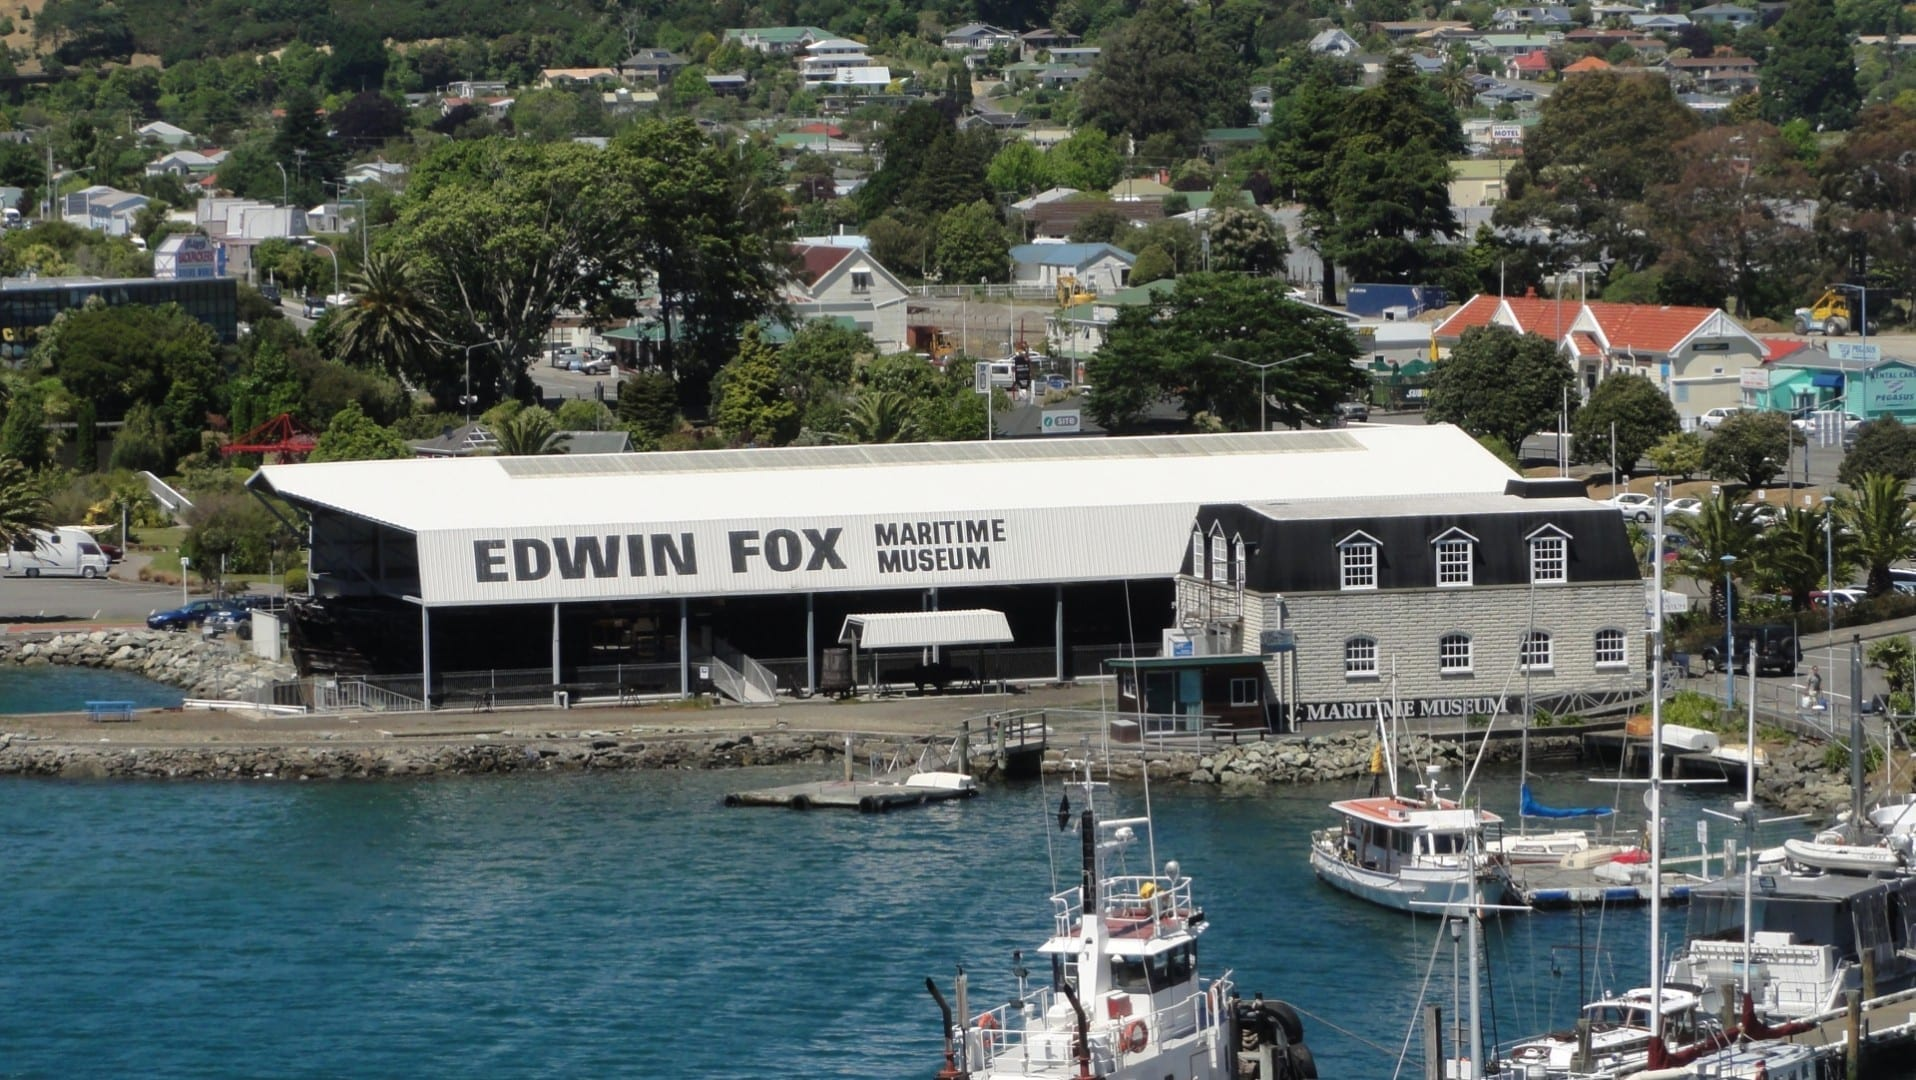 Museo Marítimo Picton Edwin Fox Picton Nueva Zelanda